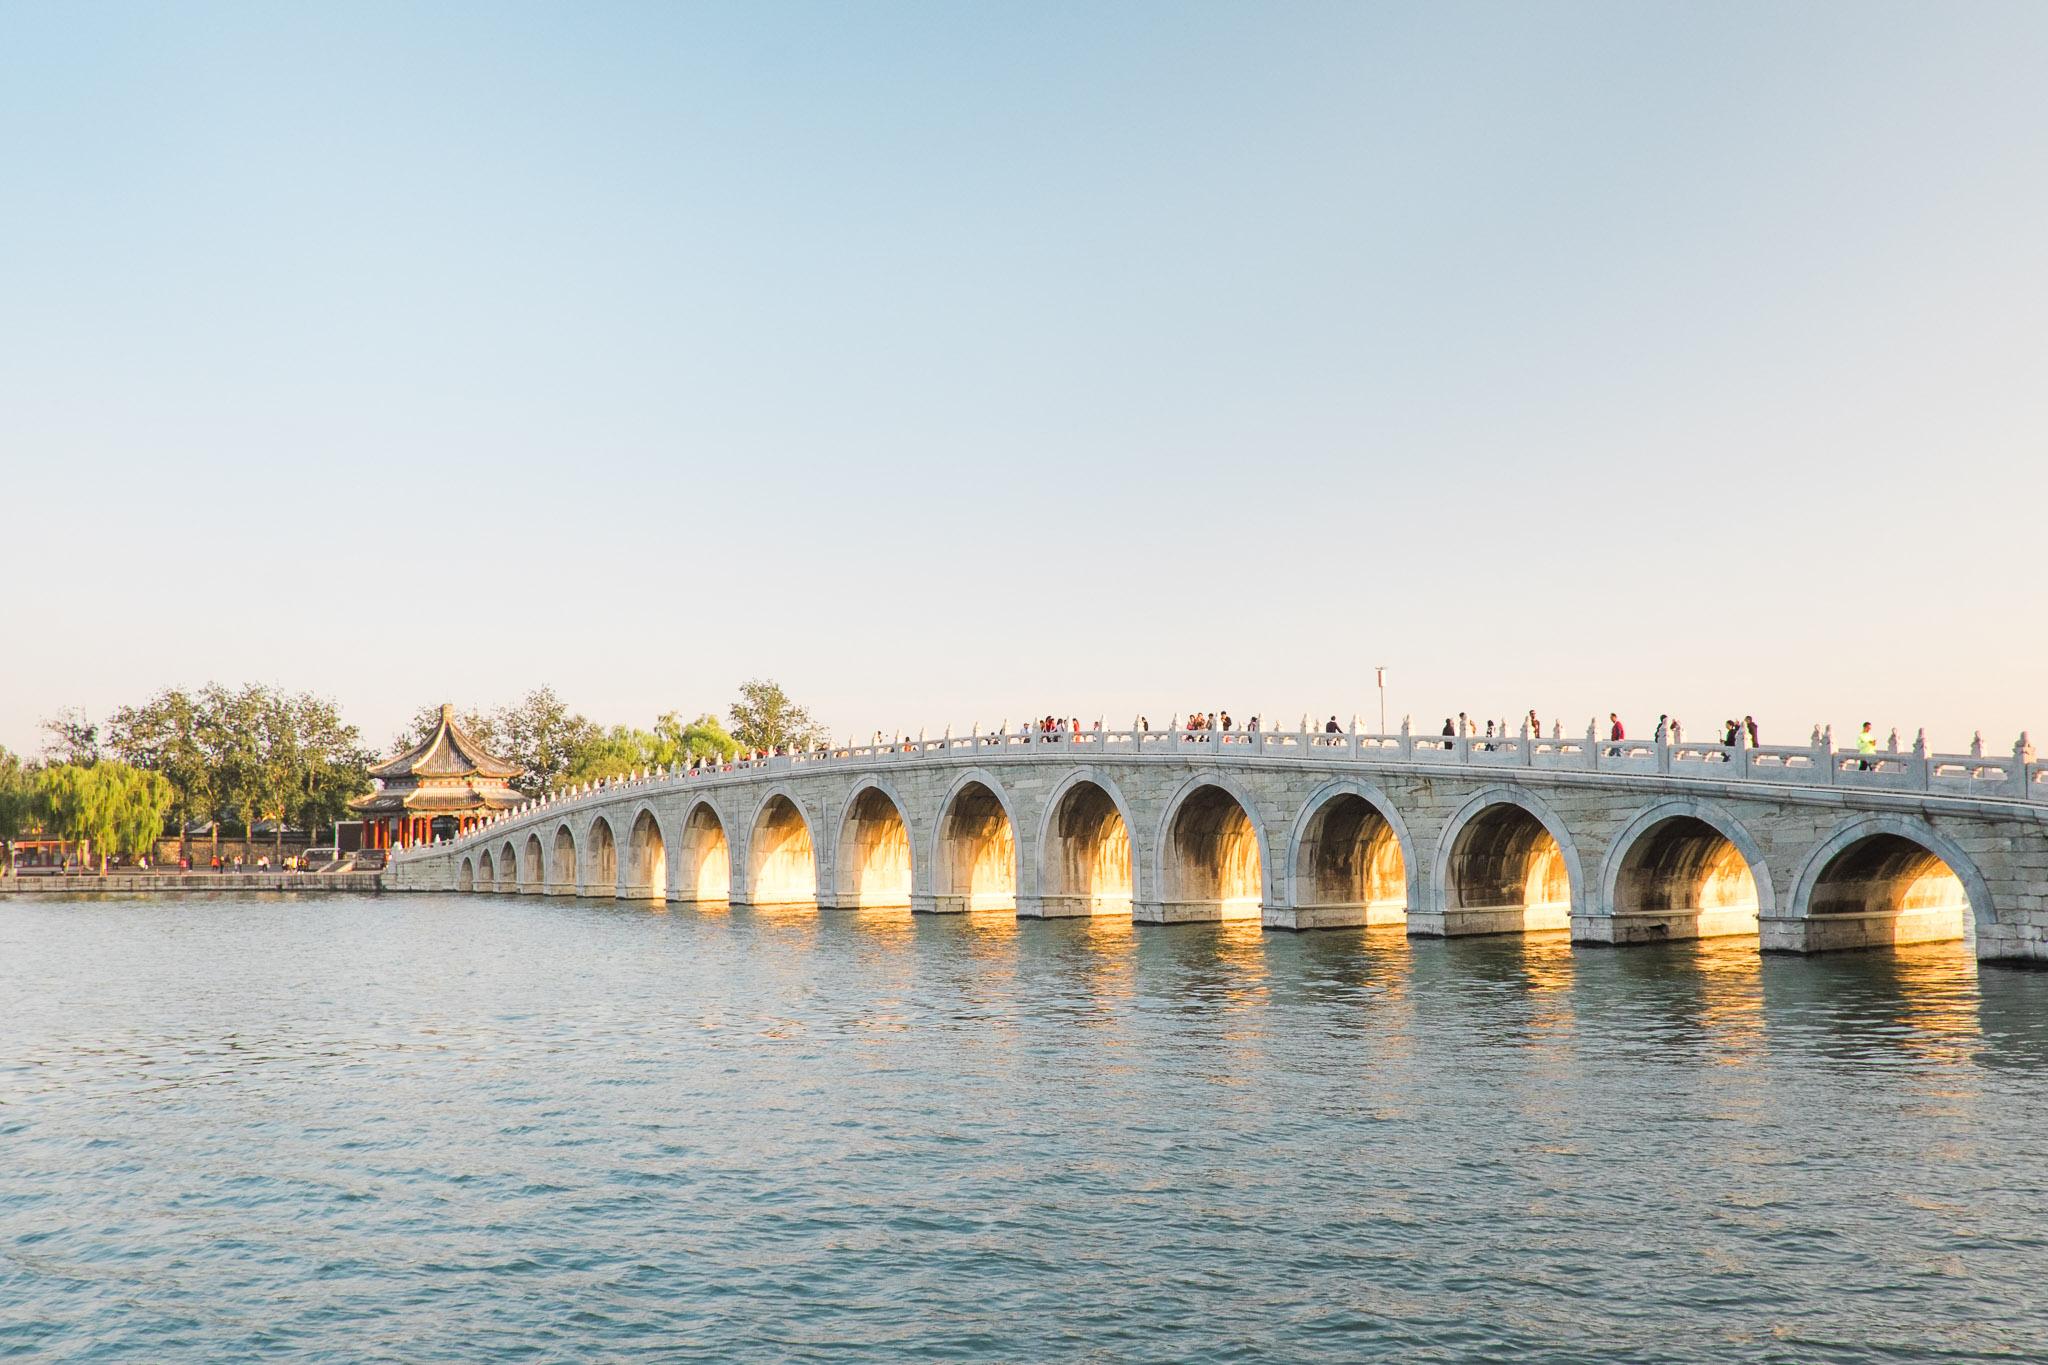 china-beijing-summer-palace-17-arch-bridge.jpg